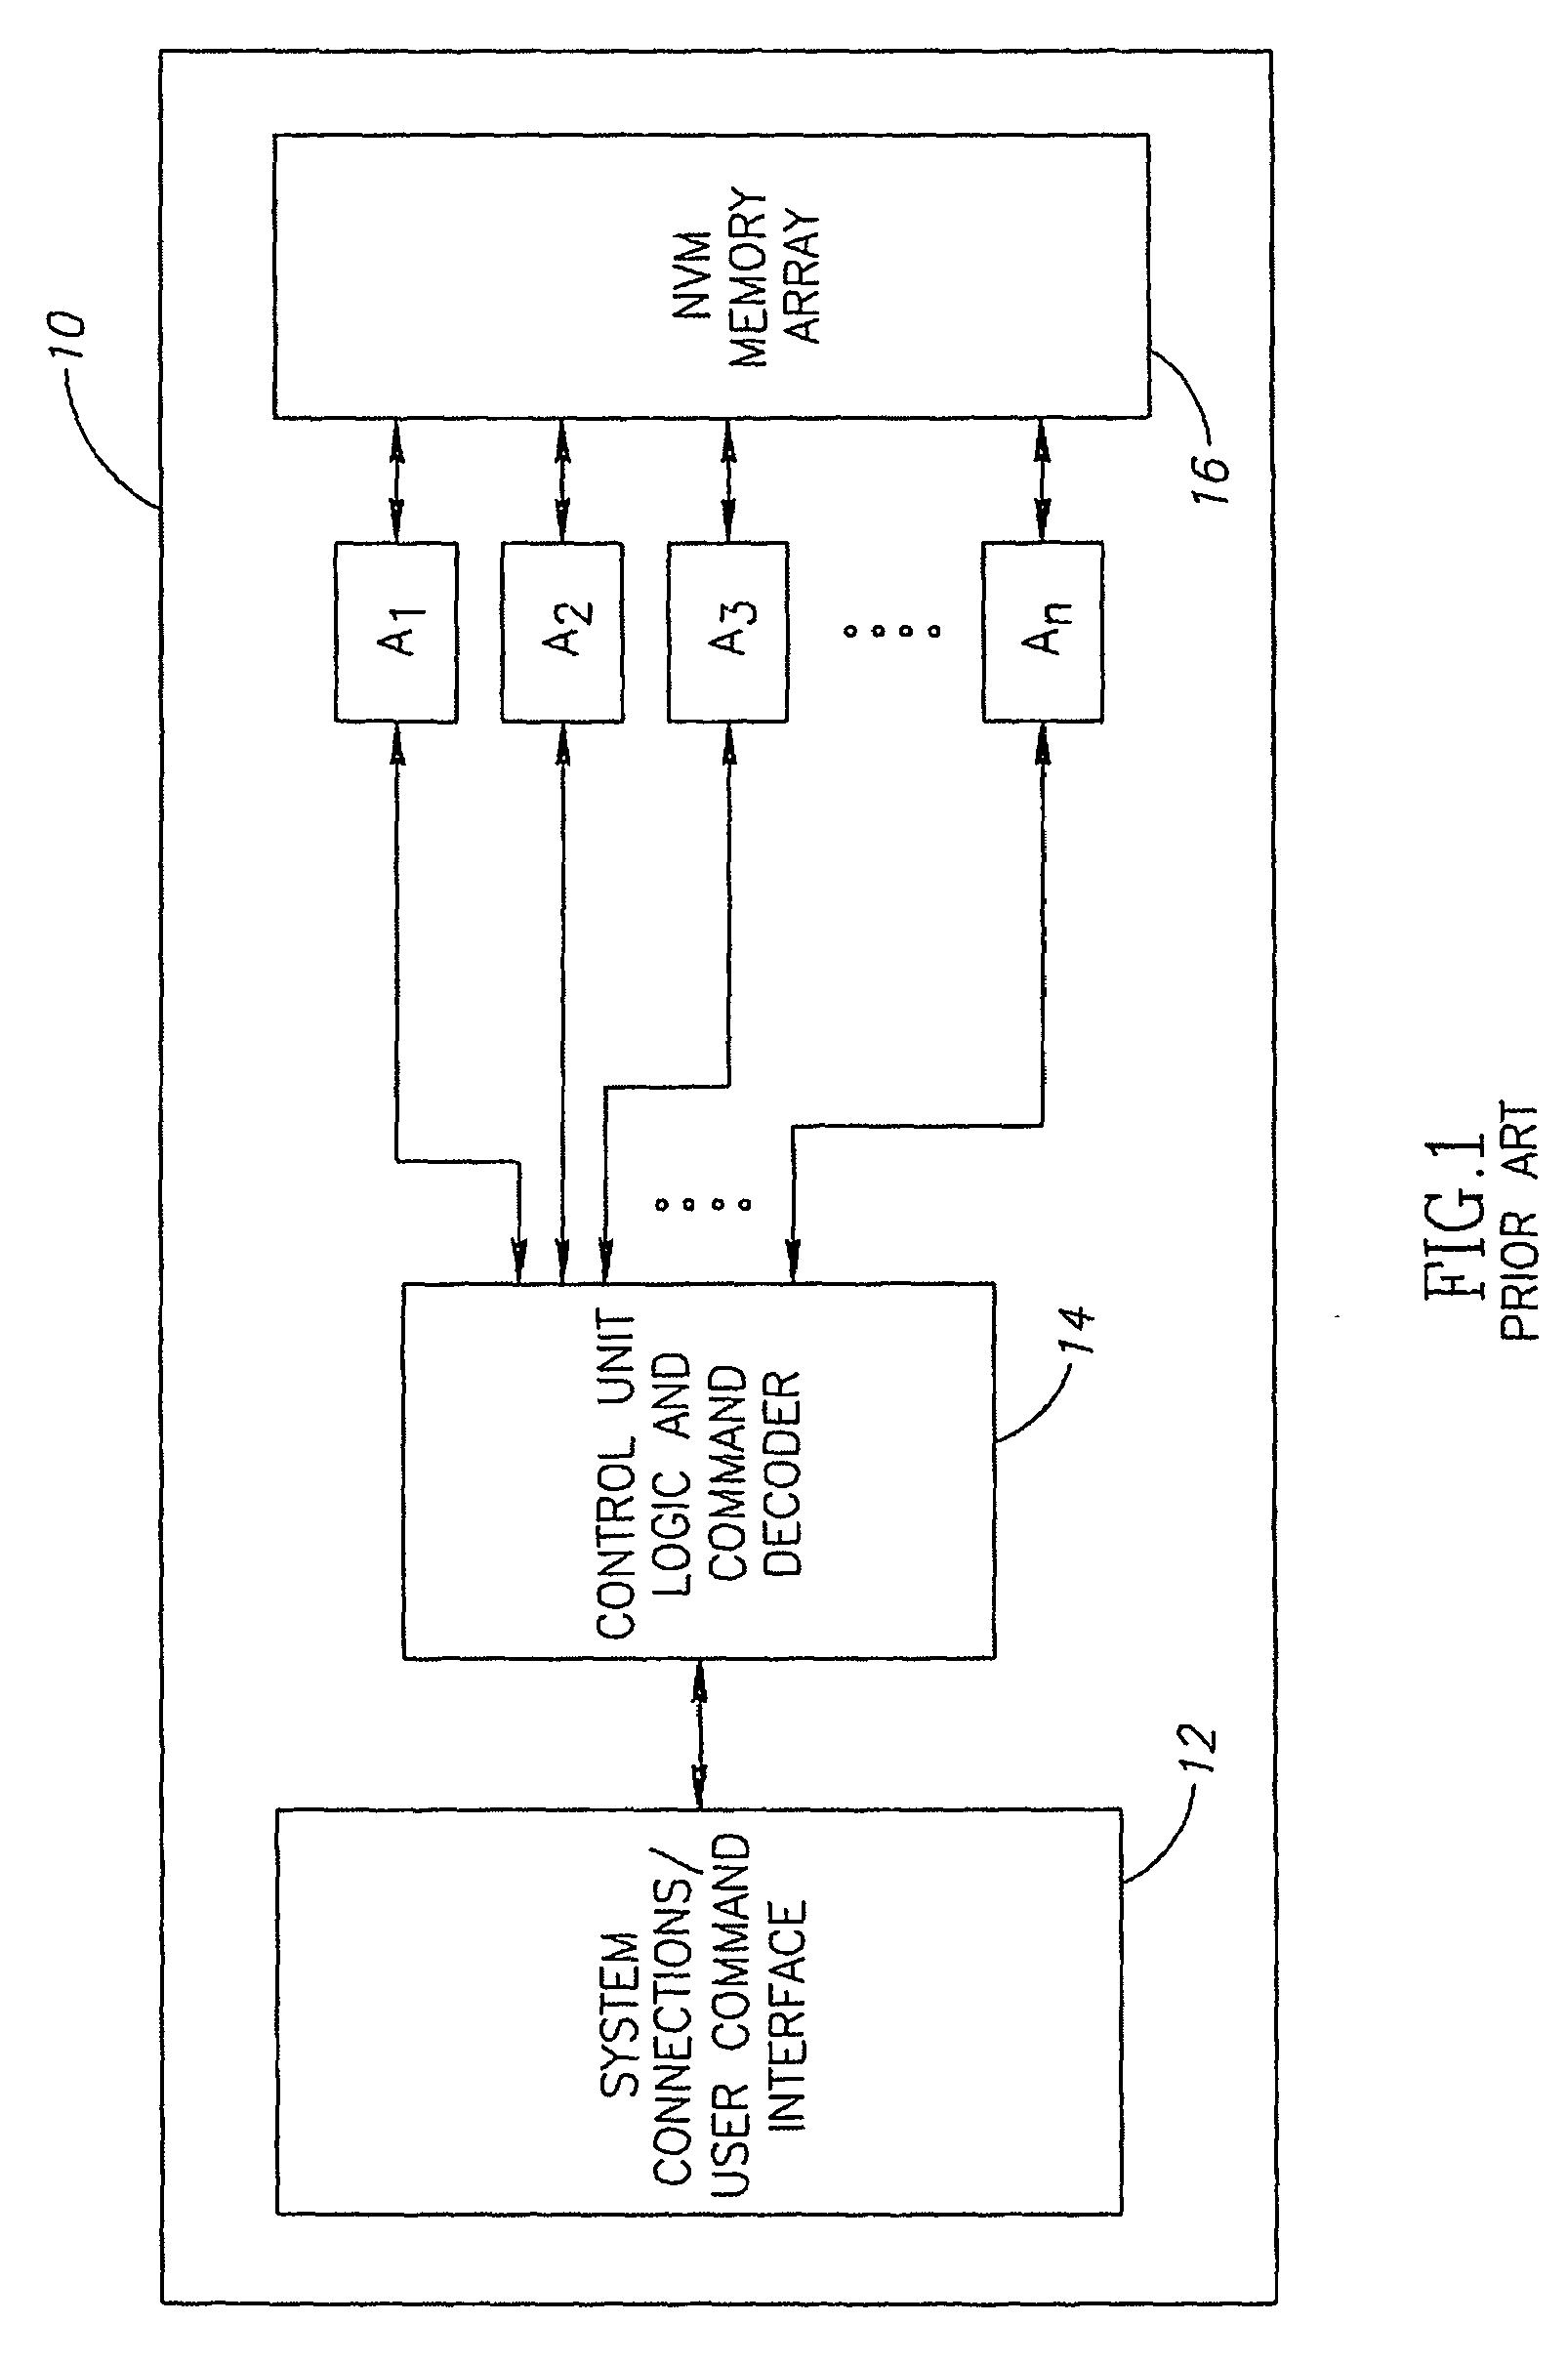 专利ep1632952a2 - dispositif